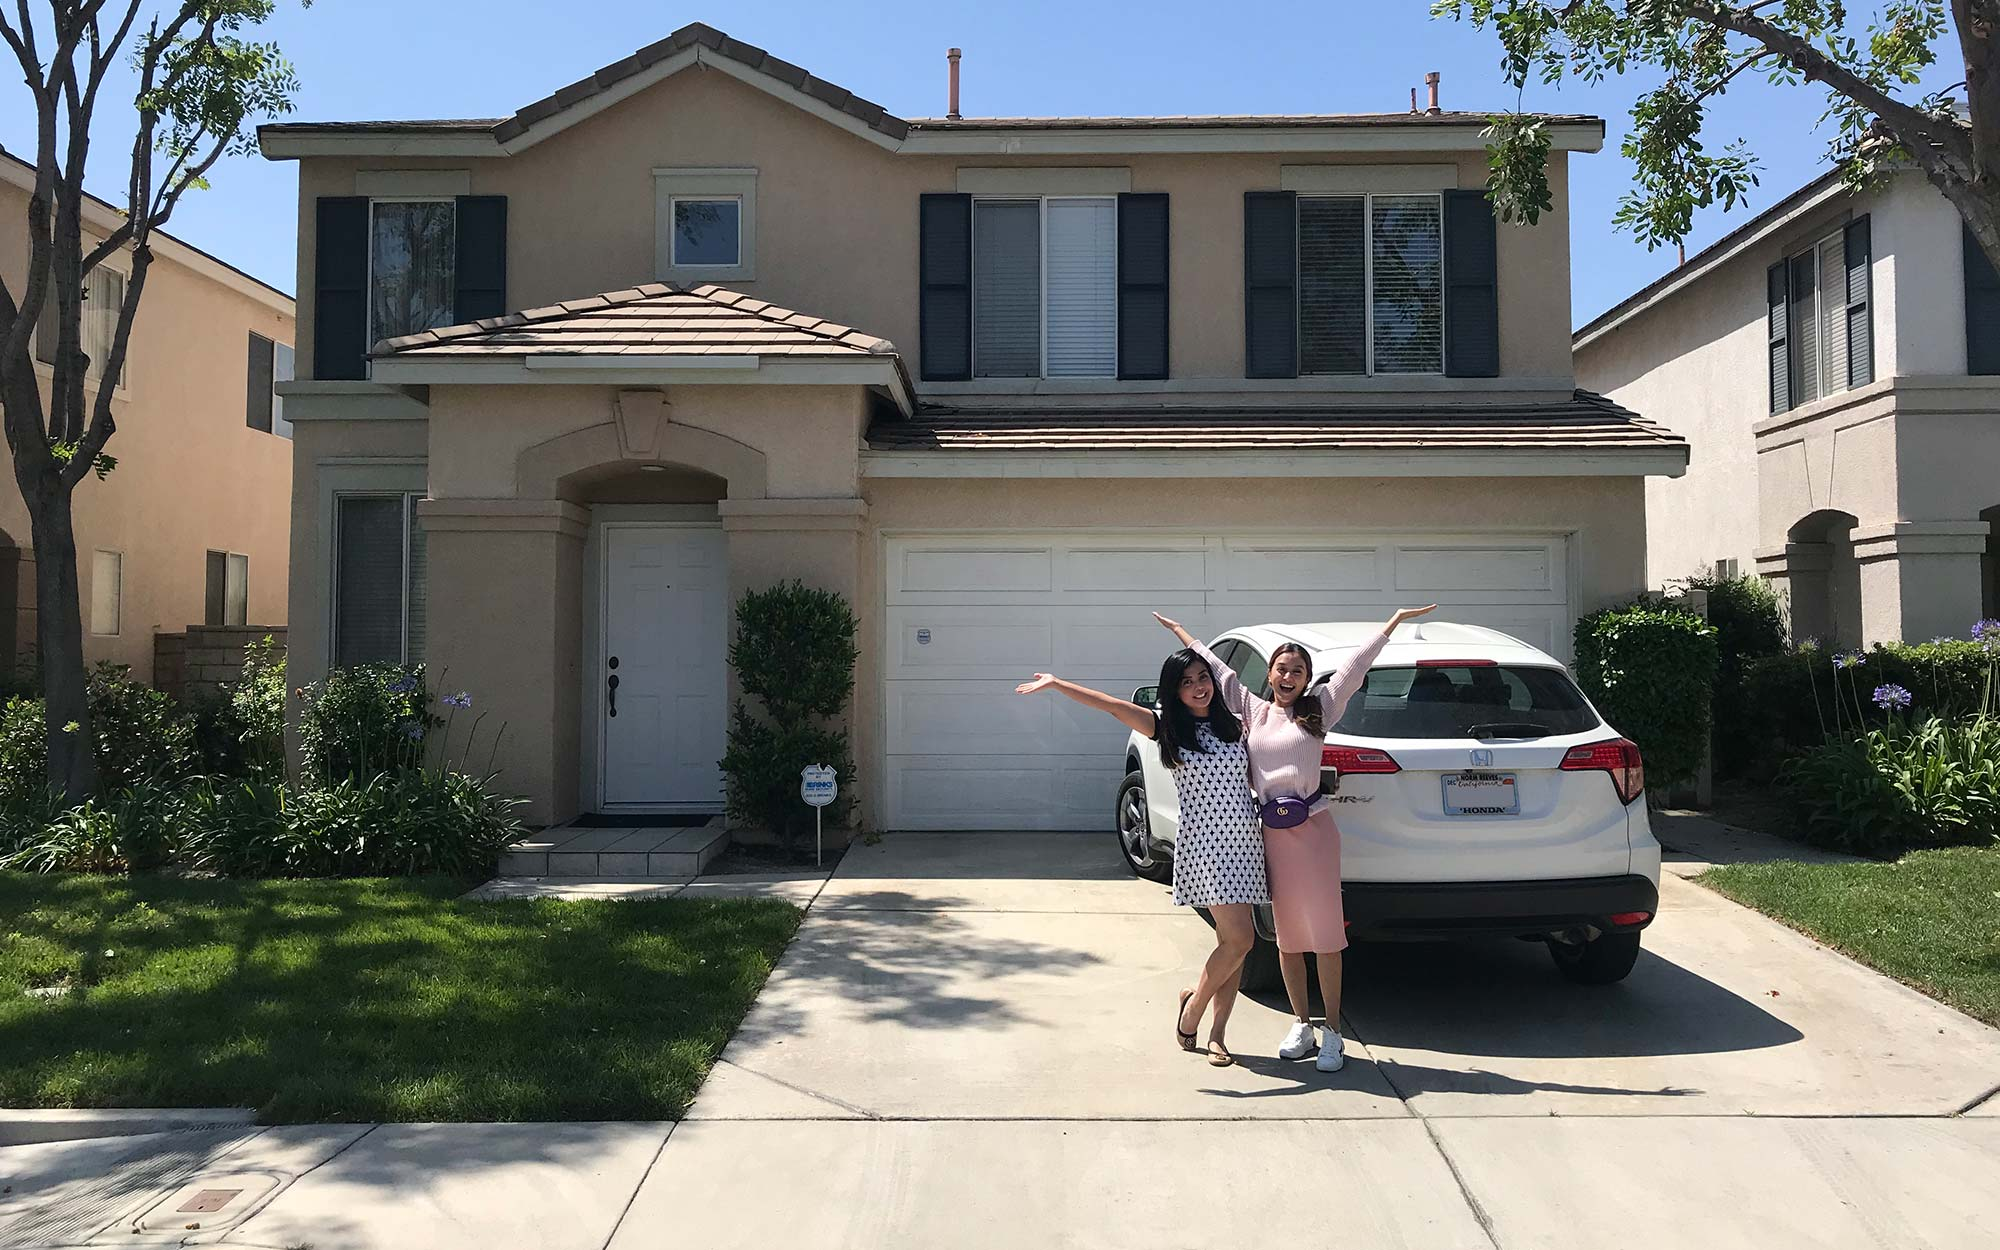 Kris Bernal's vacation house in California